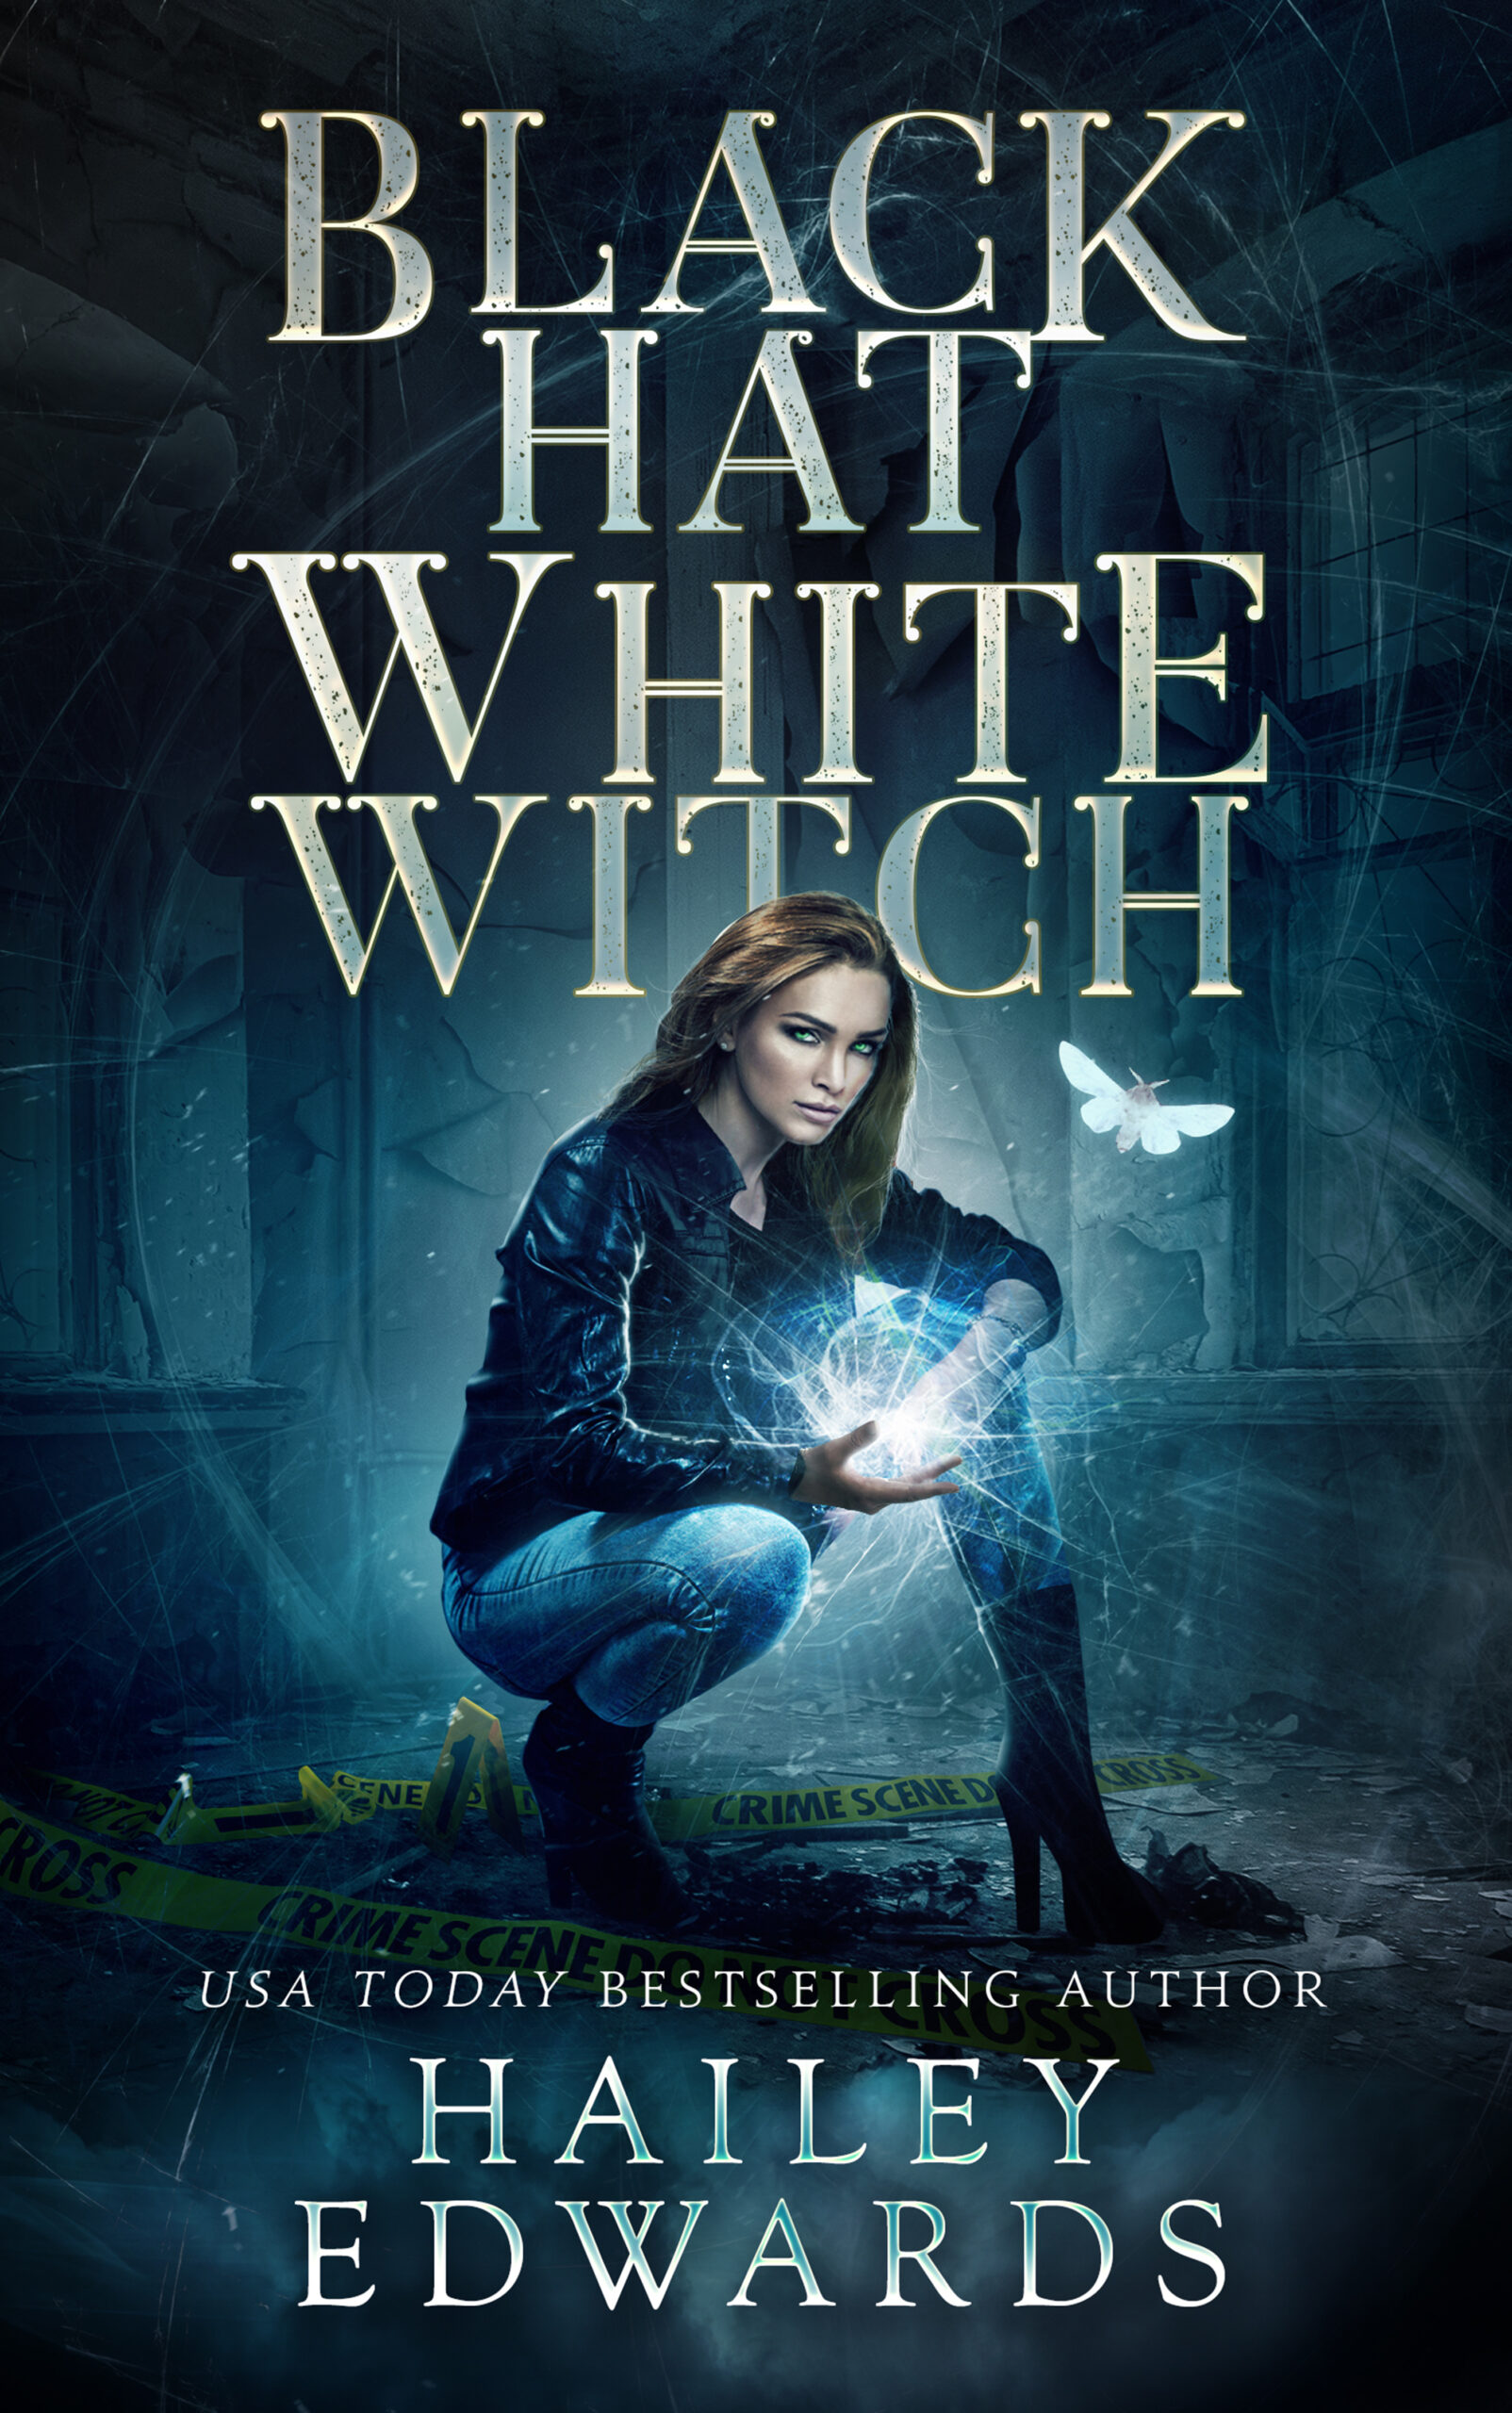 Black Hat White Witch